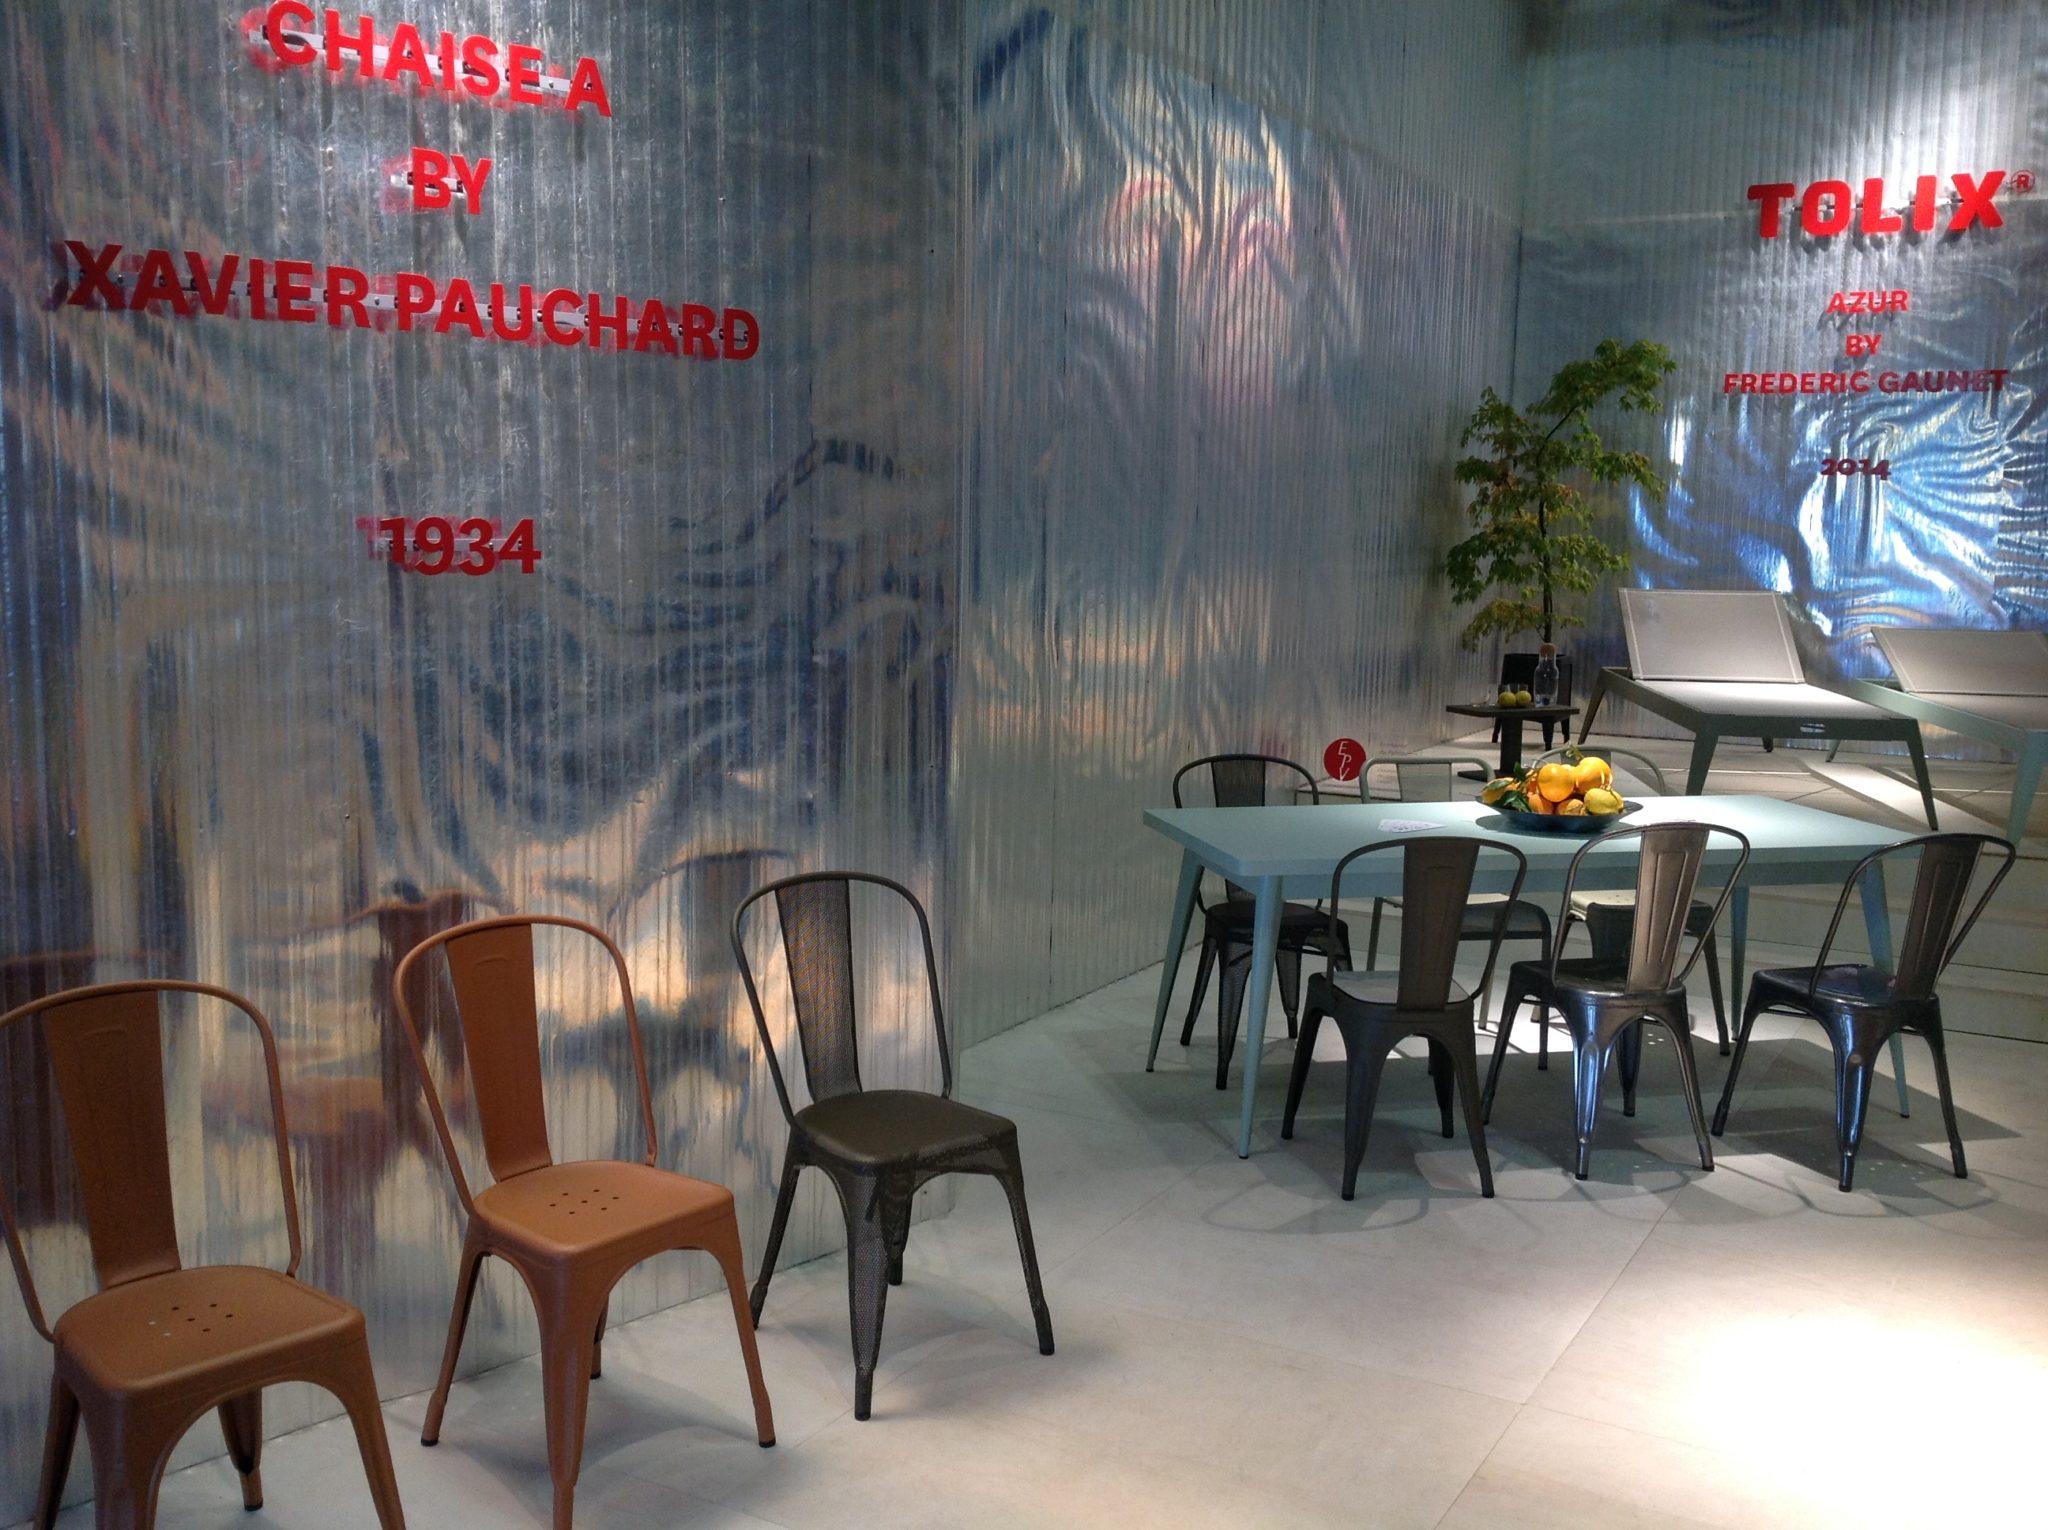 26 iSaloni 2014 milano design week interior design fair design de luxe luksosowe meble targi w mediolanie Tolix